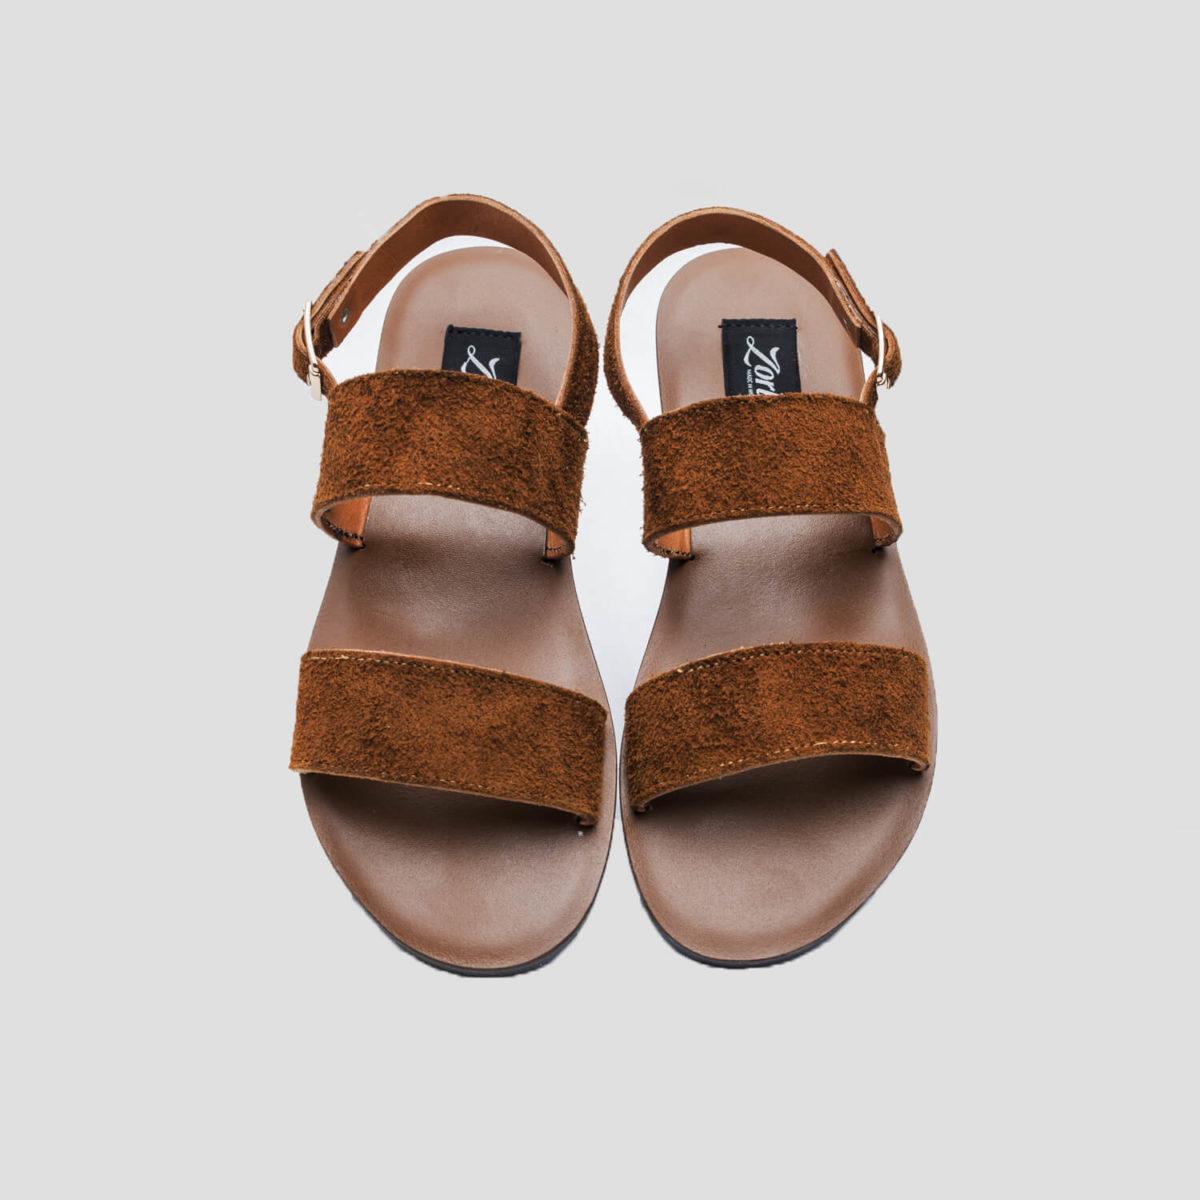 veneta sandals brown suede zorkle shoes lagos nigeria